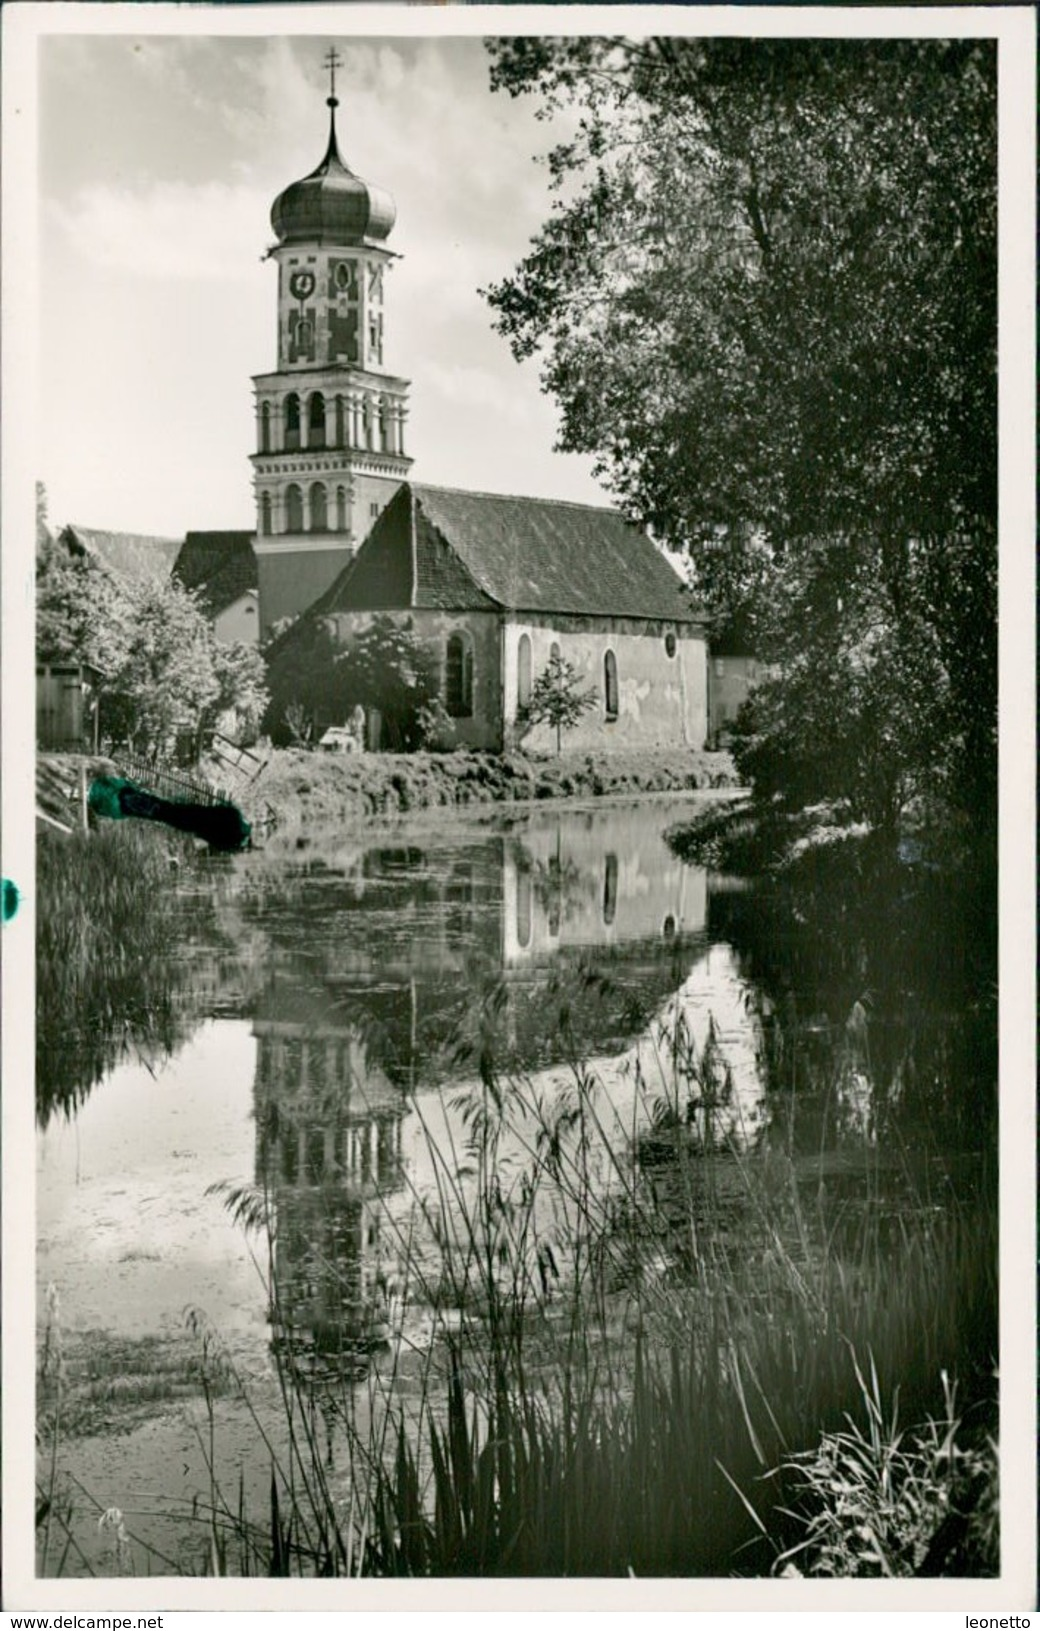 AK Meßkirch, Altkatholische Kirche, Ca. 1950er Jahre (20353) - Otros